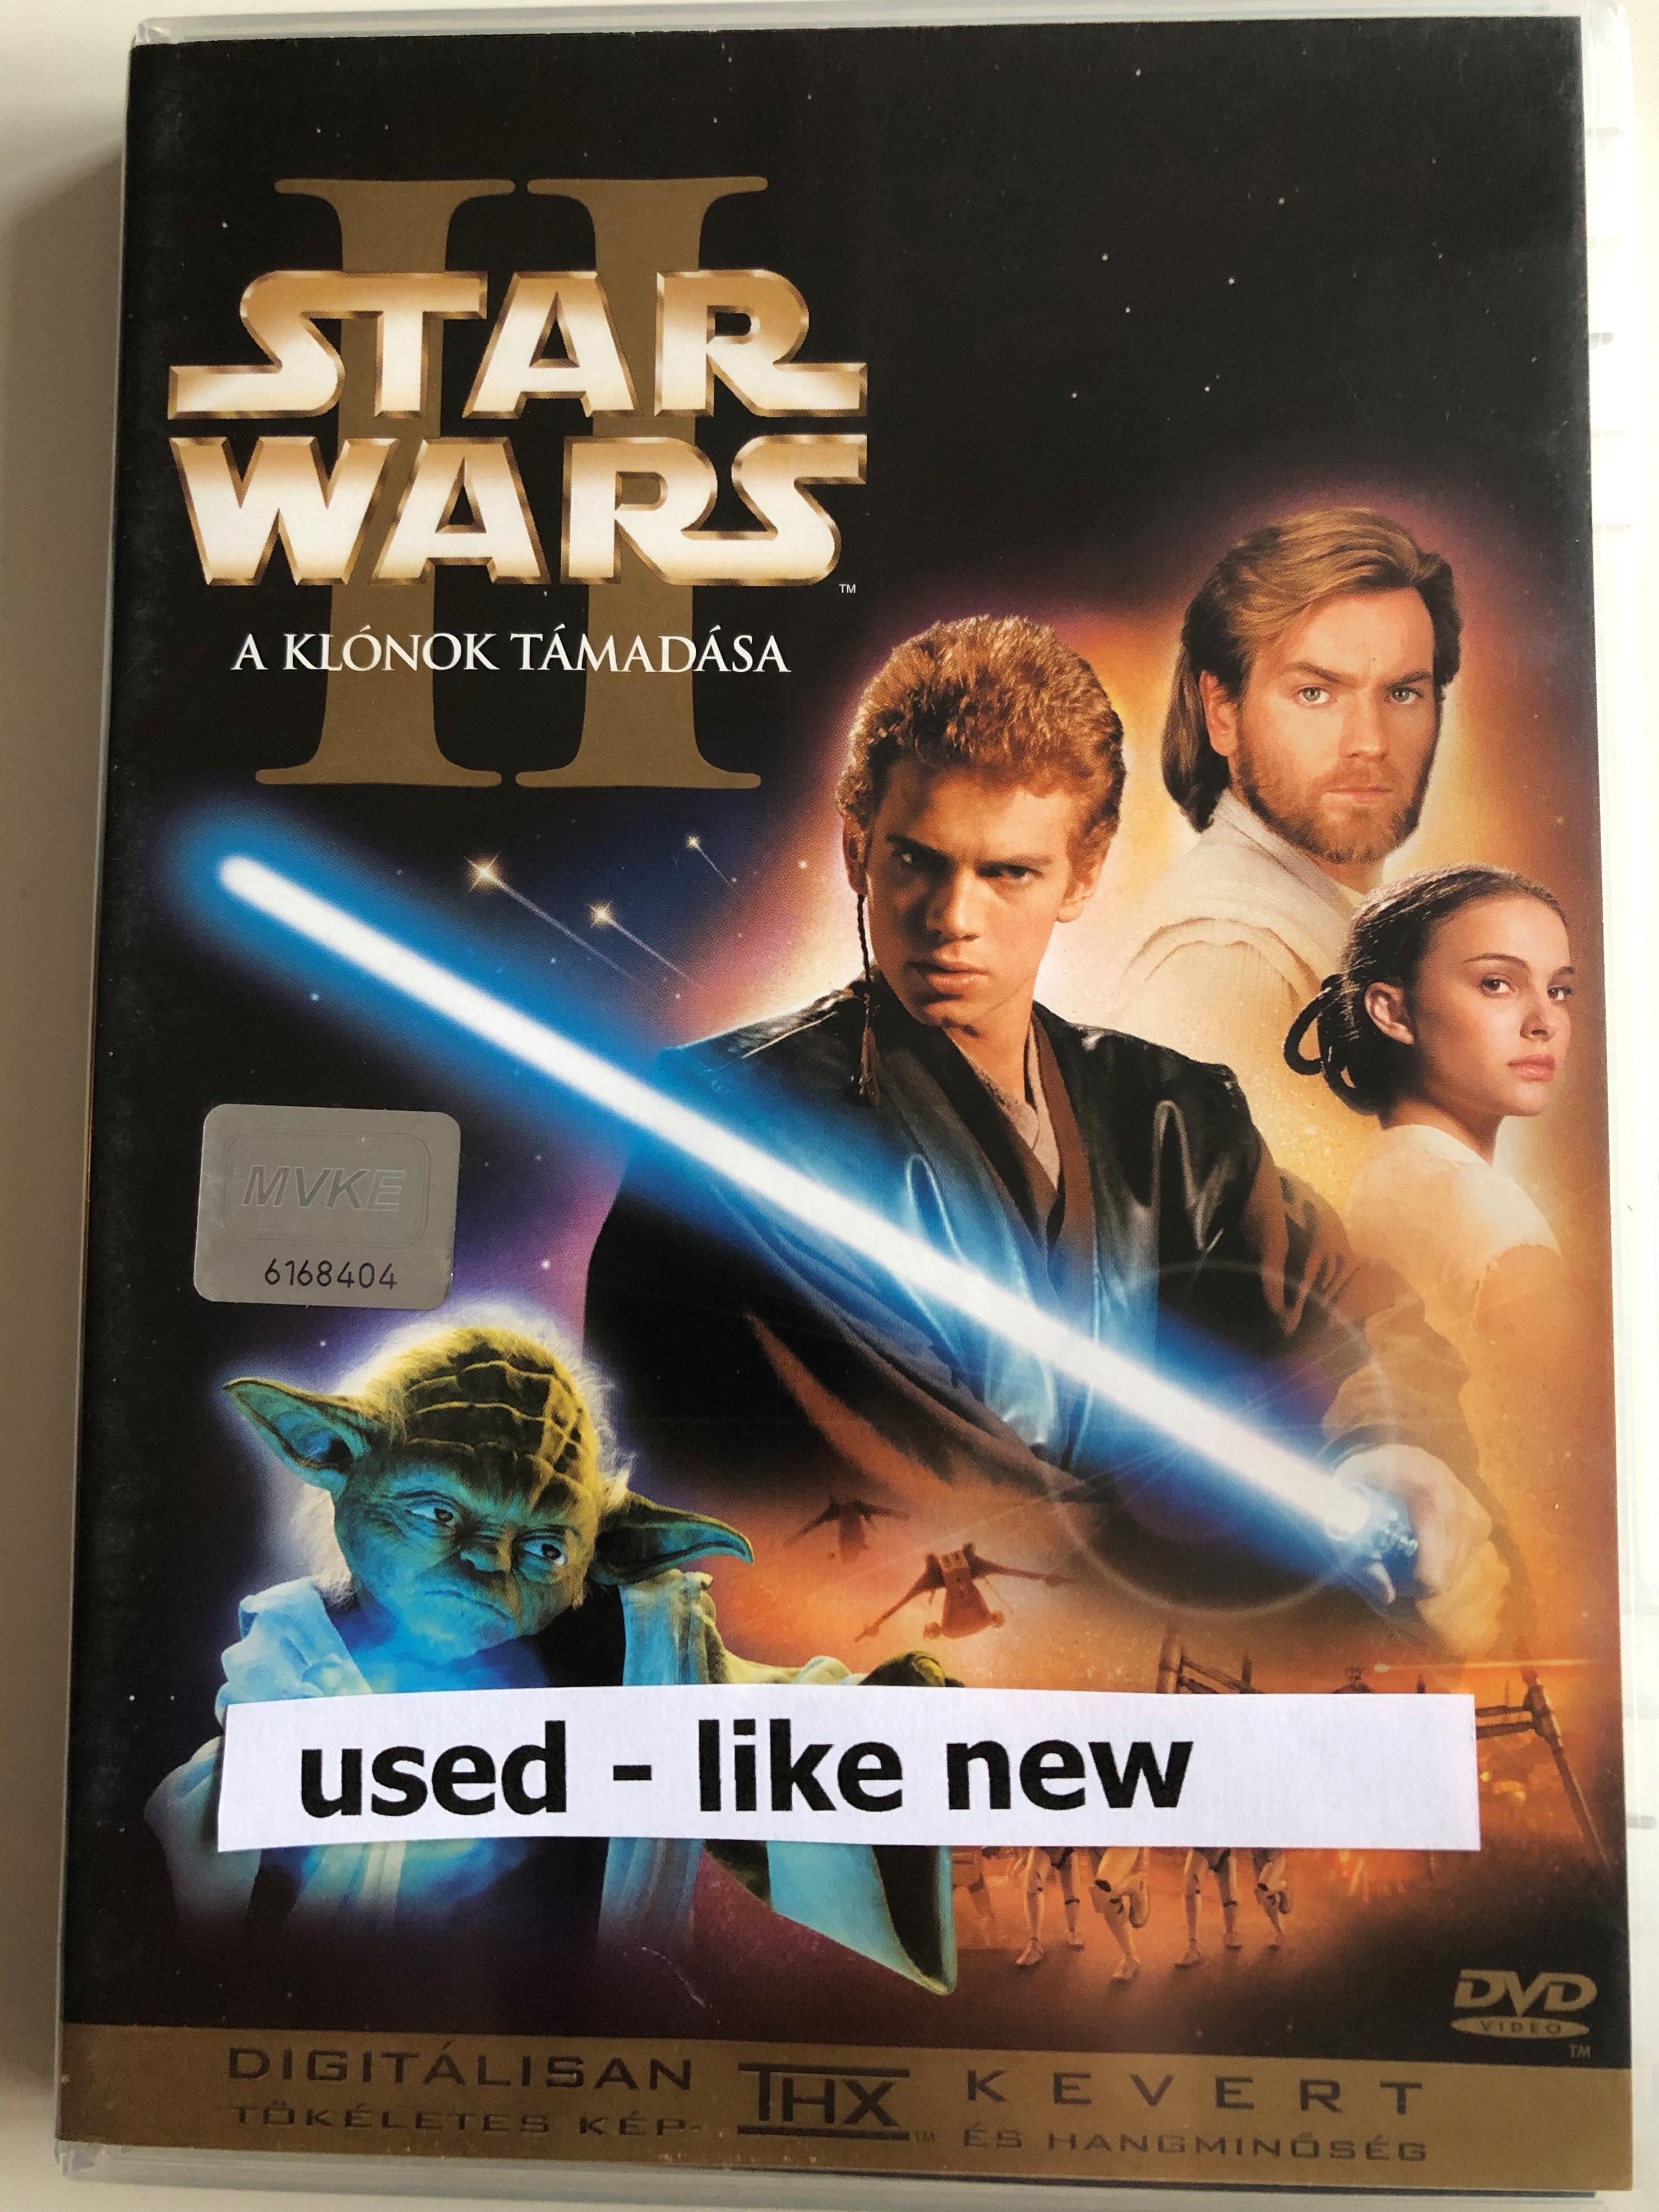 star-wars-ii-attack-of-the-clones-dvd-2002-a-kl-nok-t-mad-sa-5.jpg